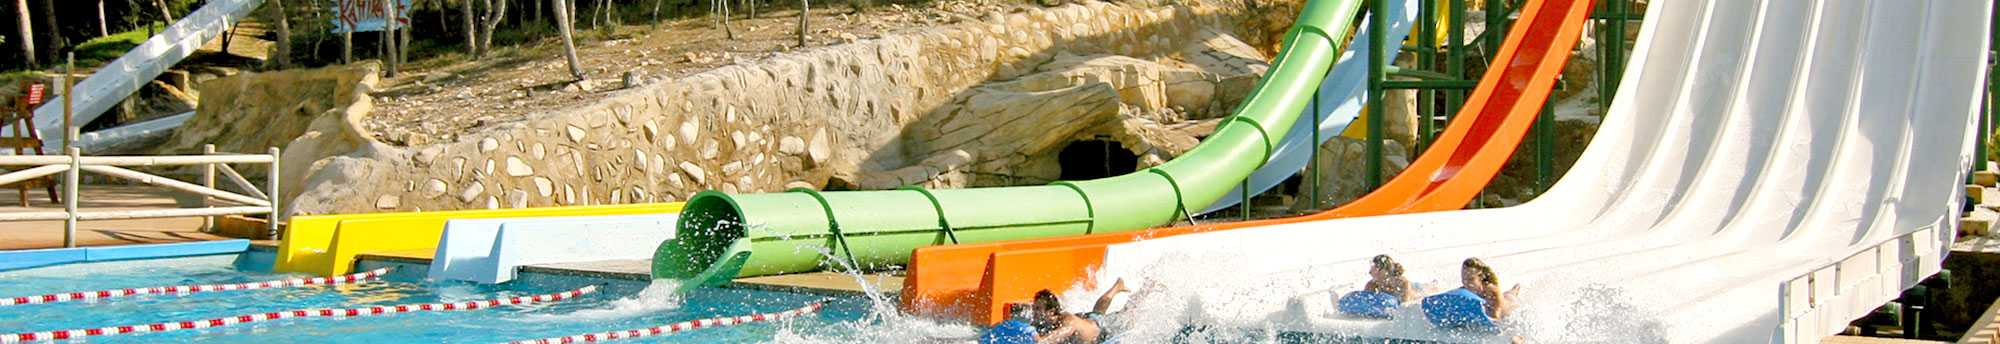 Hotel + Entradas a Aqualandia Benidorm